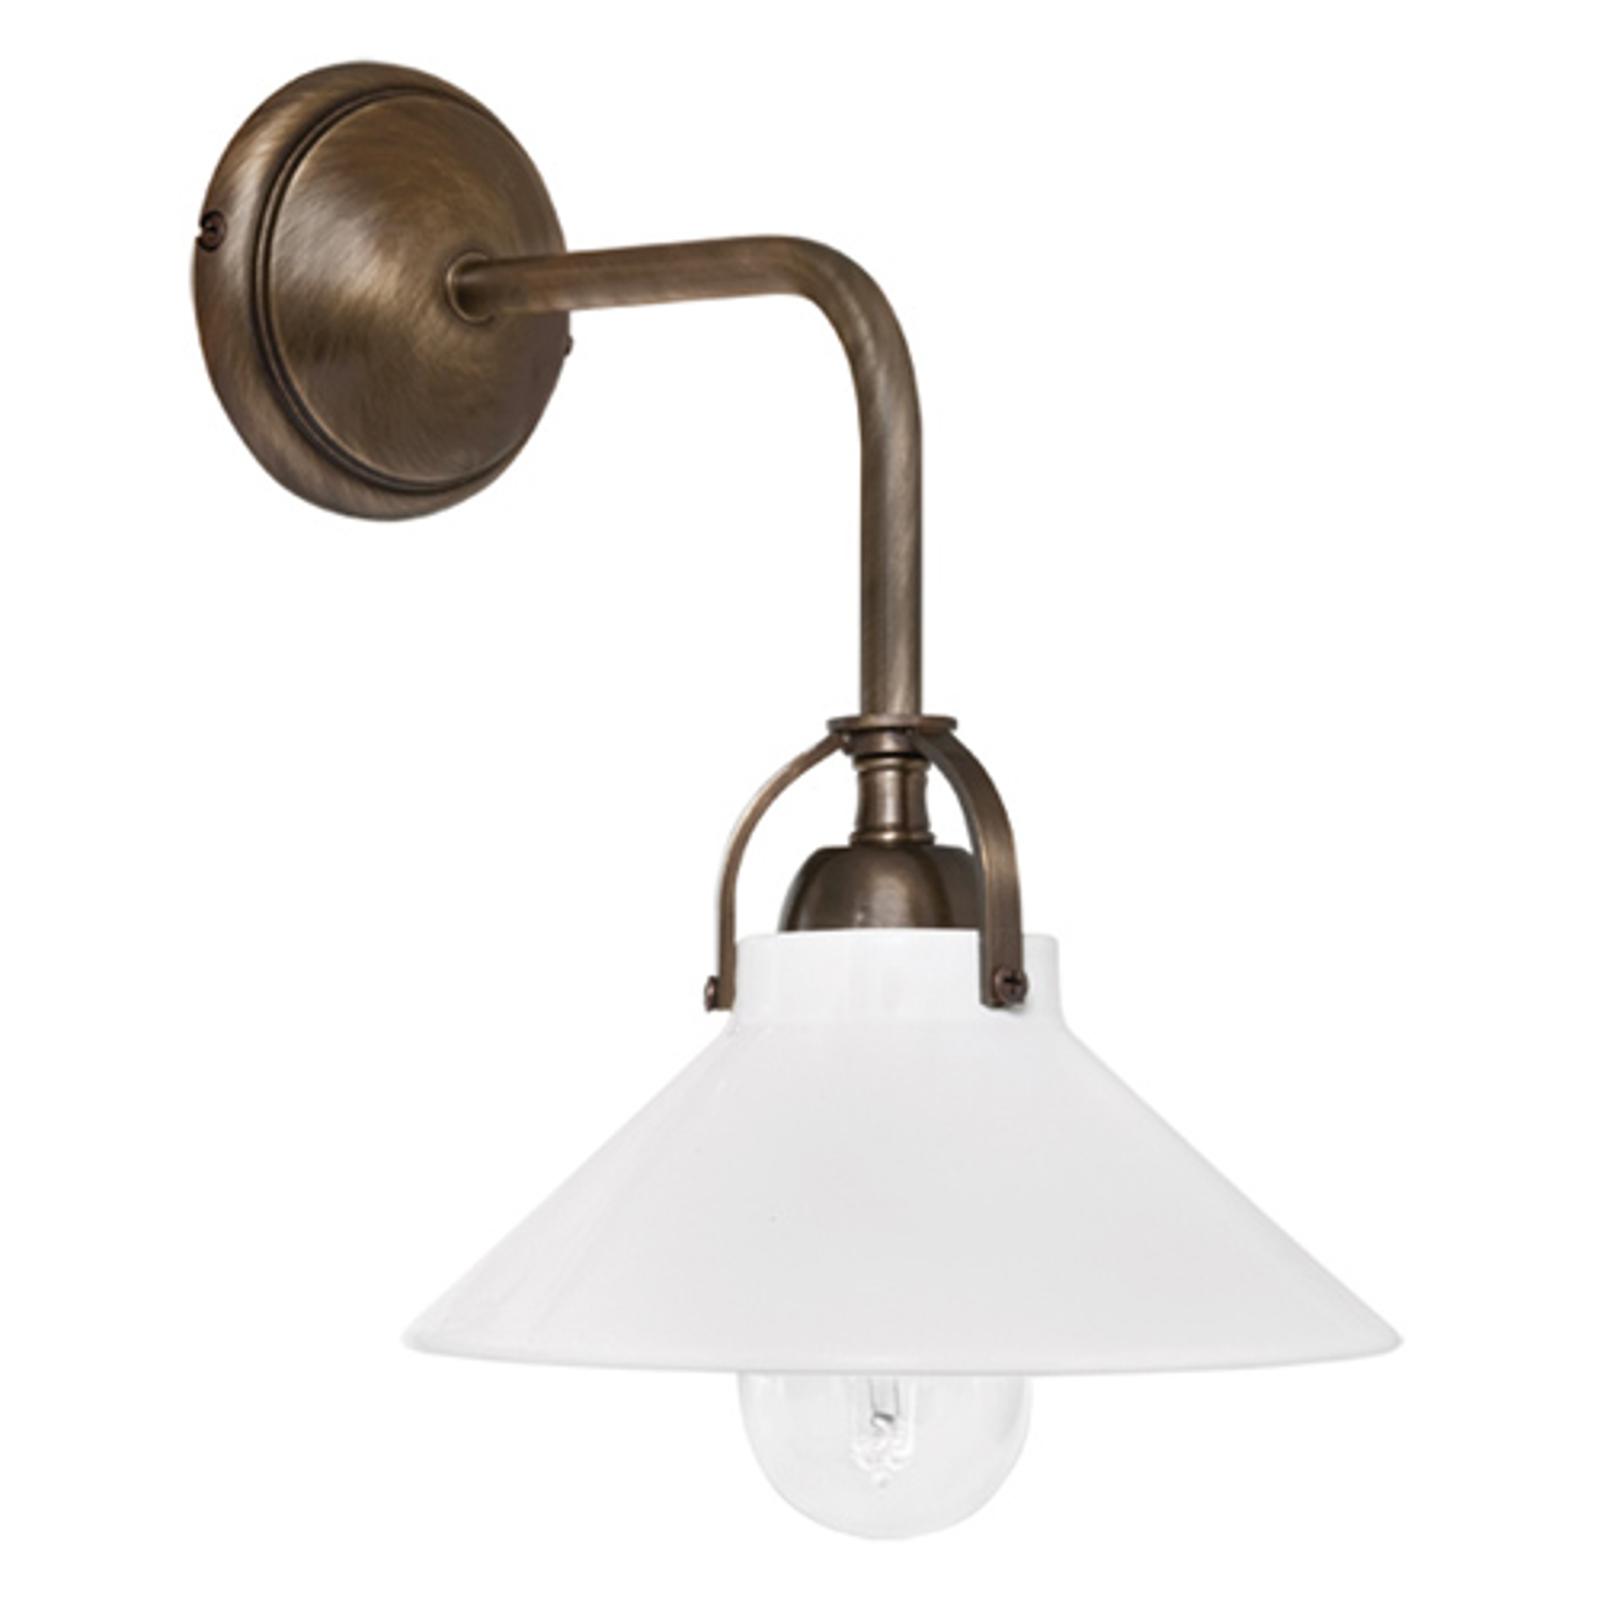 Gegoten messing - wandlamp Ike